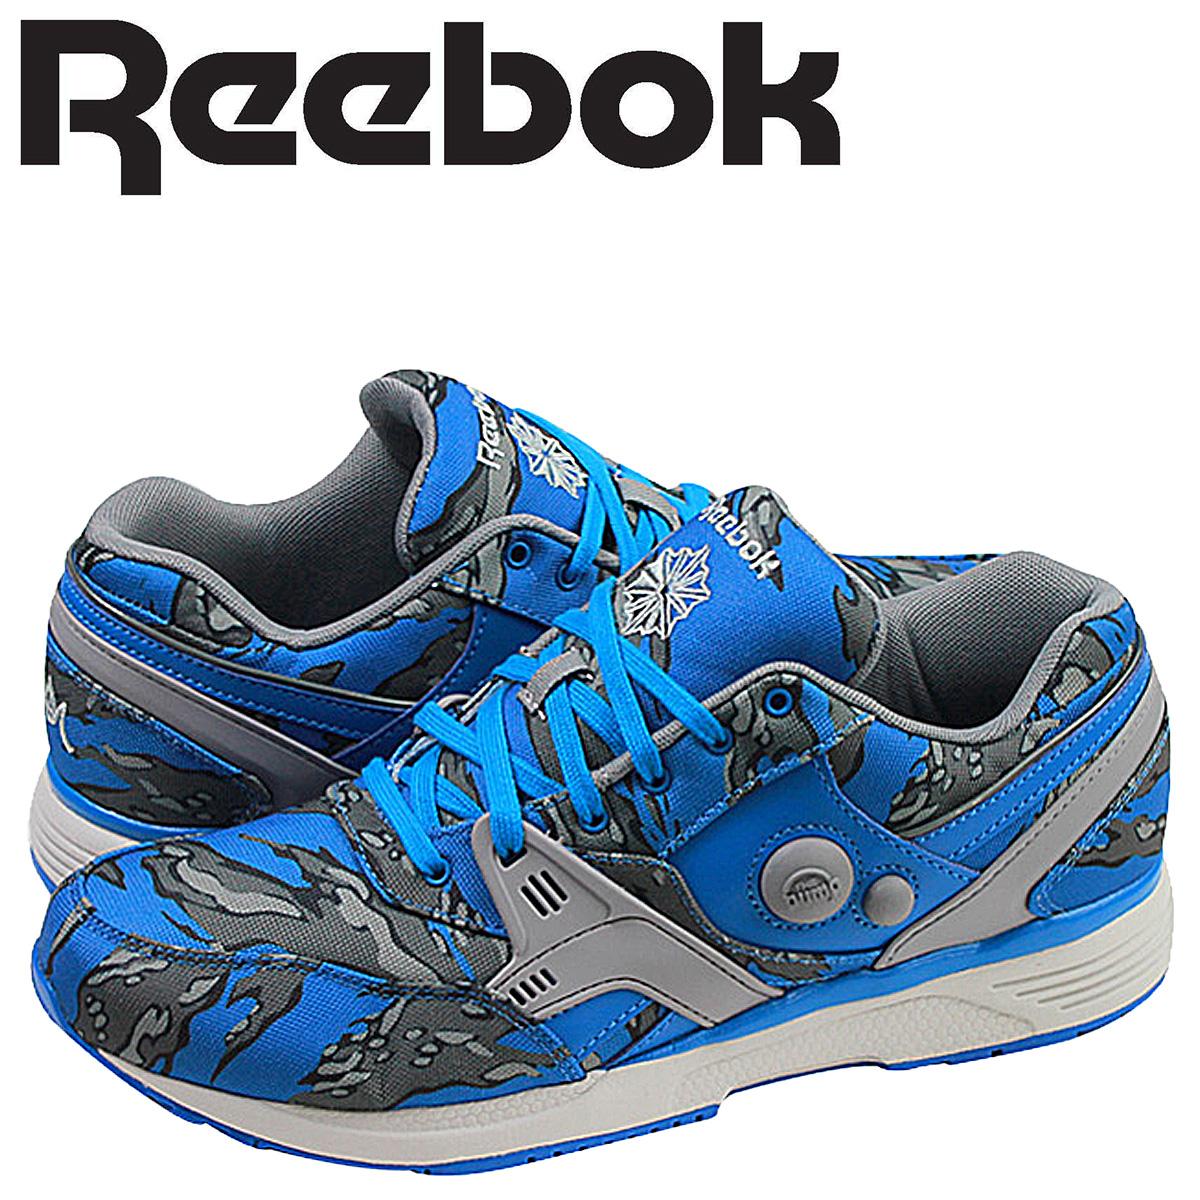 Reebok Reebok pump sneakers PUMP RUNNING DUAL STASH COLLECTION V61555 men shoes blue